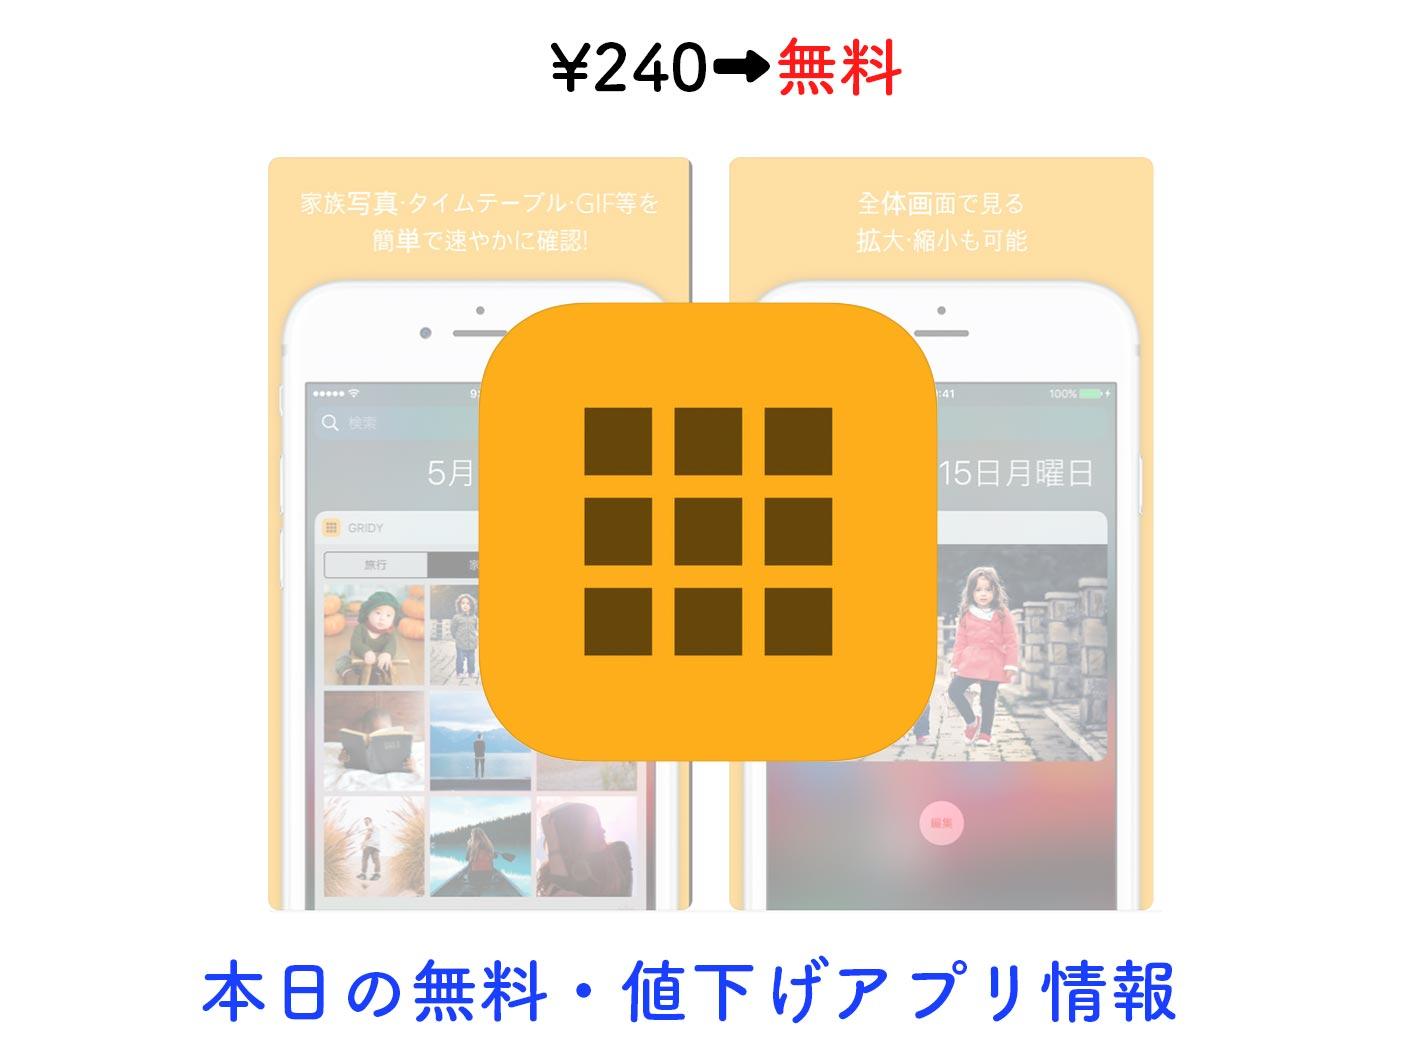 Appsale0628